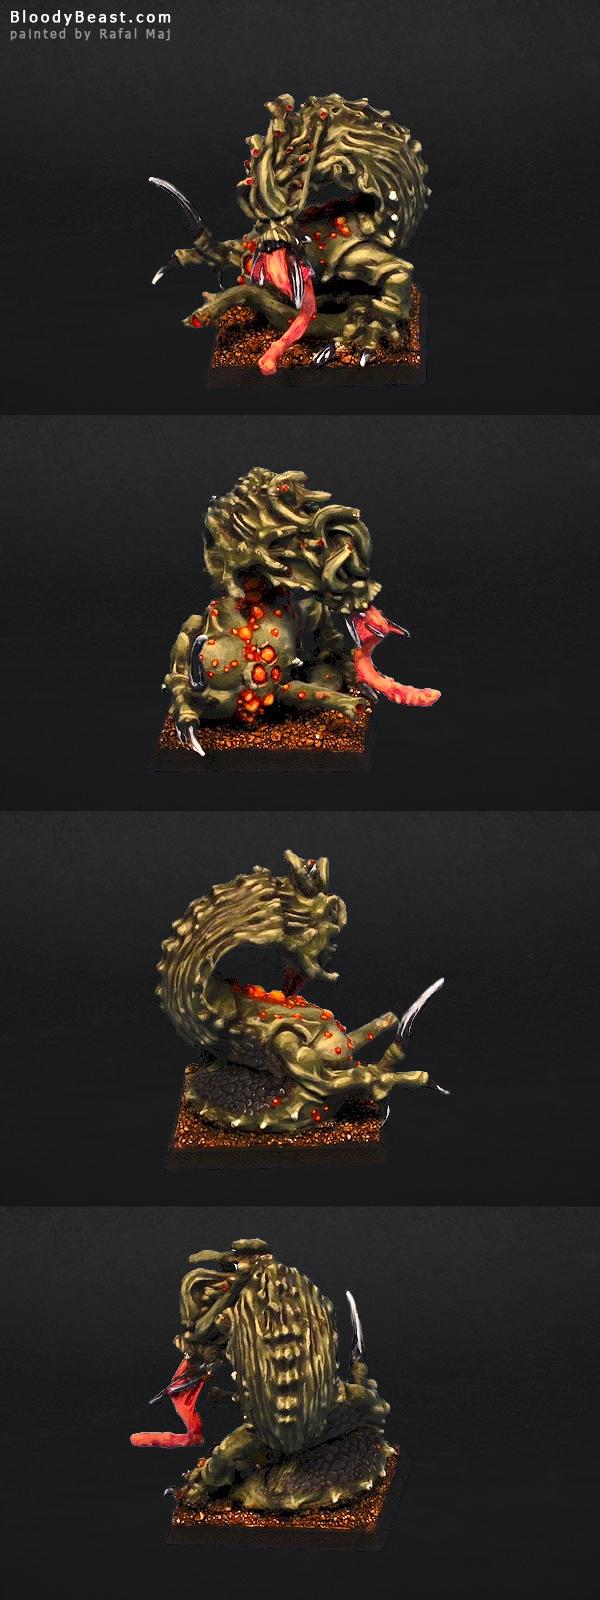 Chaos Daemons Nurgle Beast painted by Rafal Maj (BloodyBeast.com)